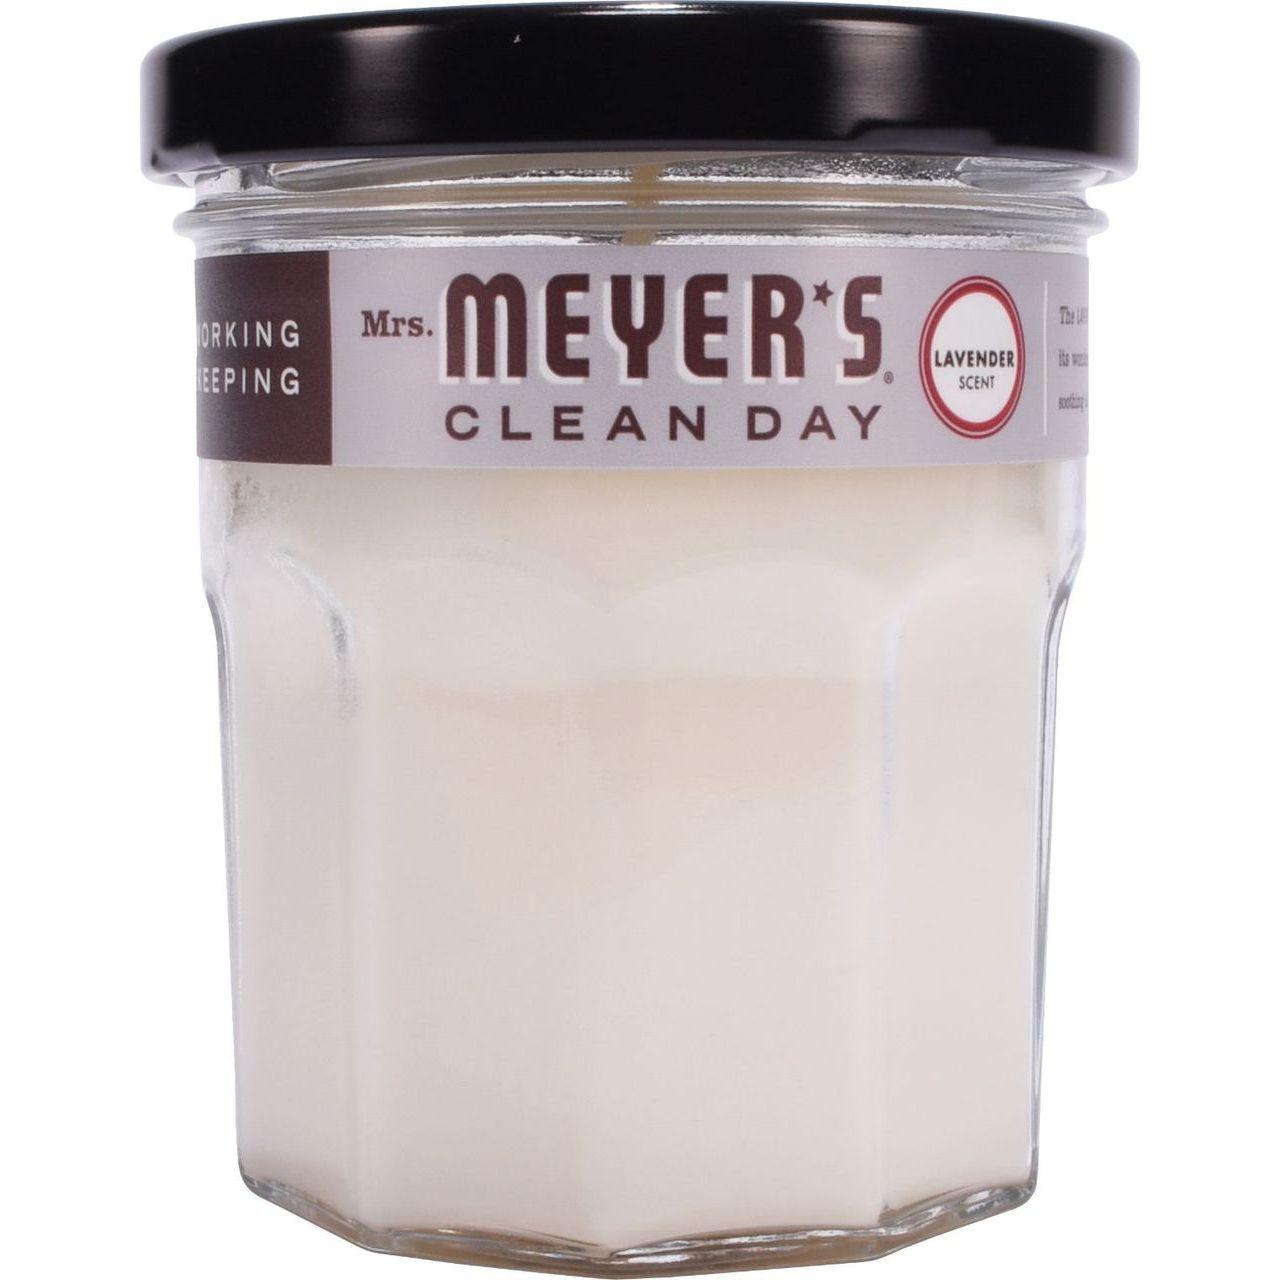 SC Johnson 4.9 oz Lavander Clean Day Glass Candle